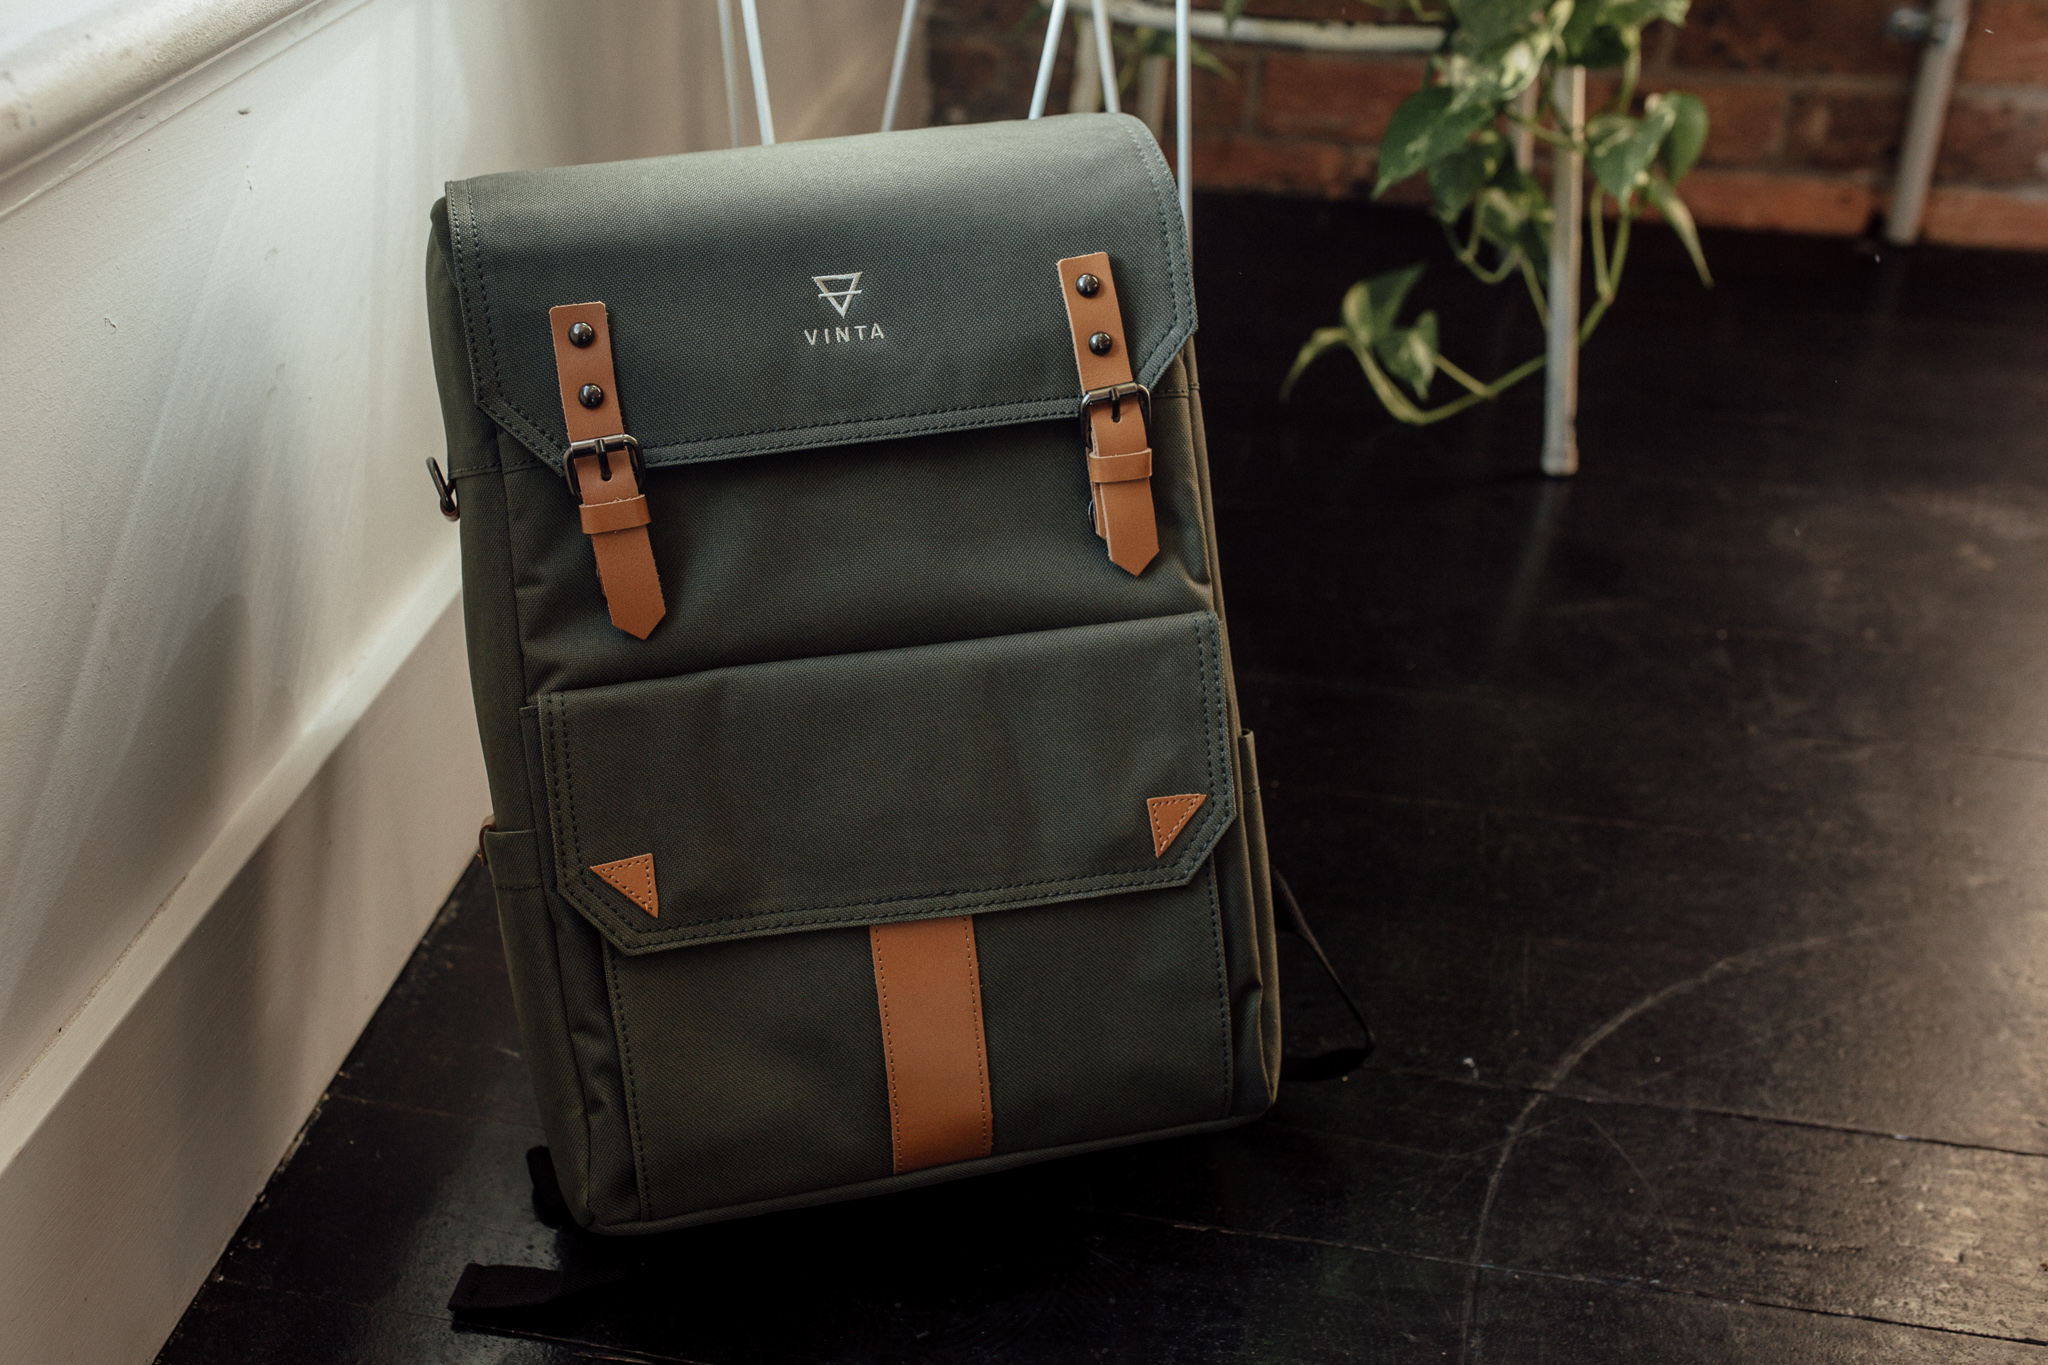 vinta co bag